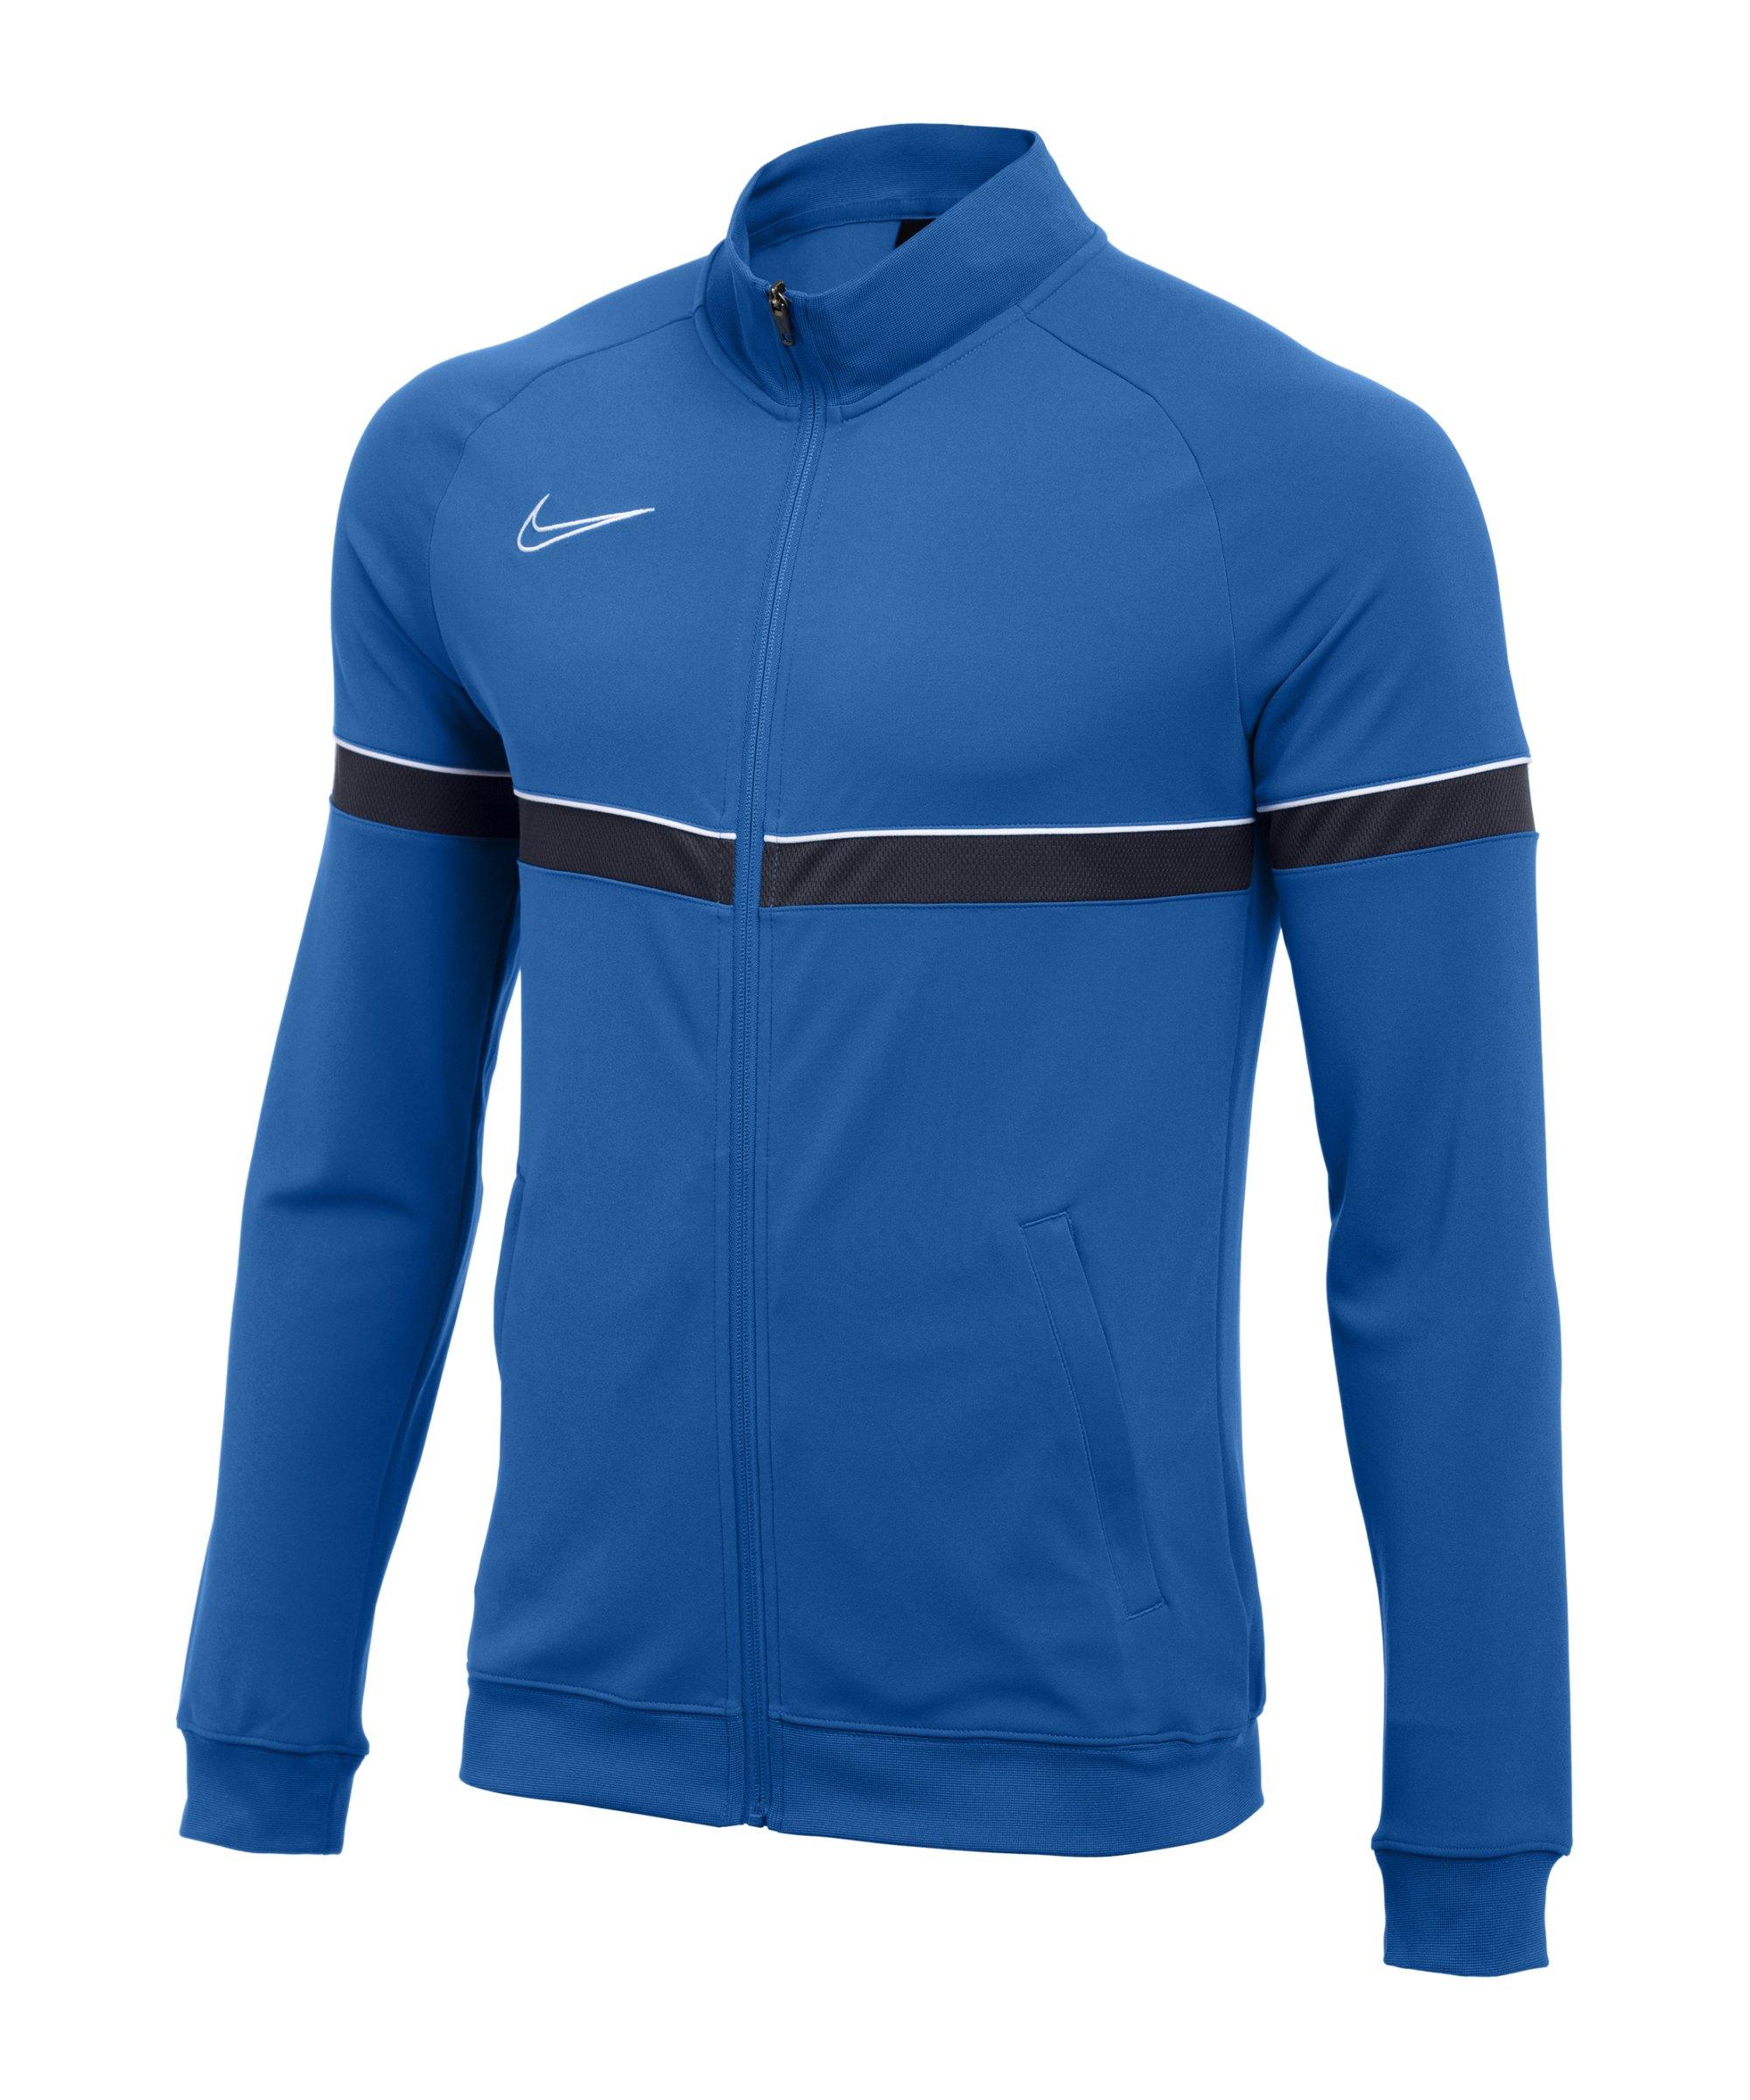 Nike Academy 21 Knit Trainingsjacke Blau F463 - blau